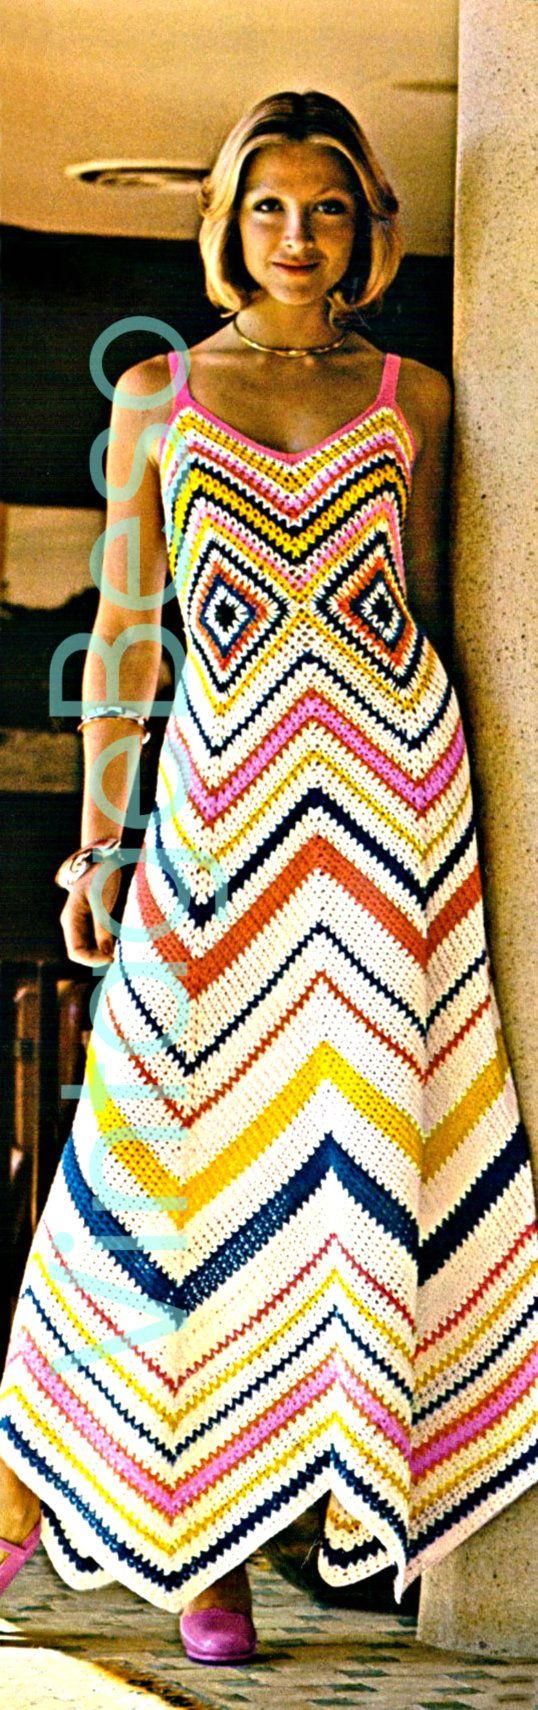 CHEVRON Crochet MAXI DRESS Instant Download pdf 1970s Vintage Crochet Pattern Clubbing Party Zig zag Boho Dress Resort Vacation Vintage Beso